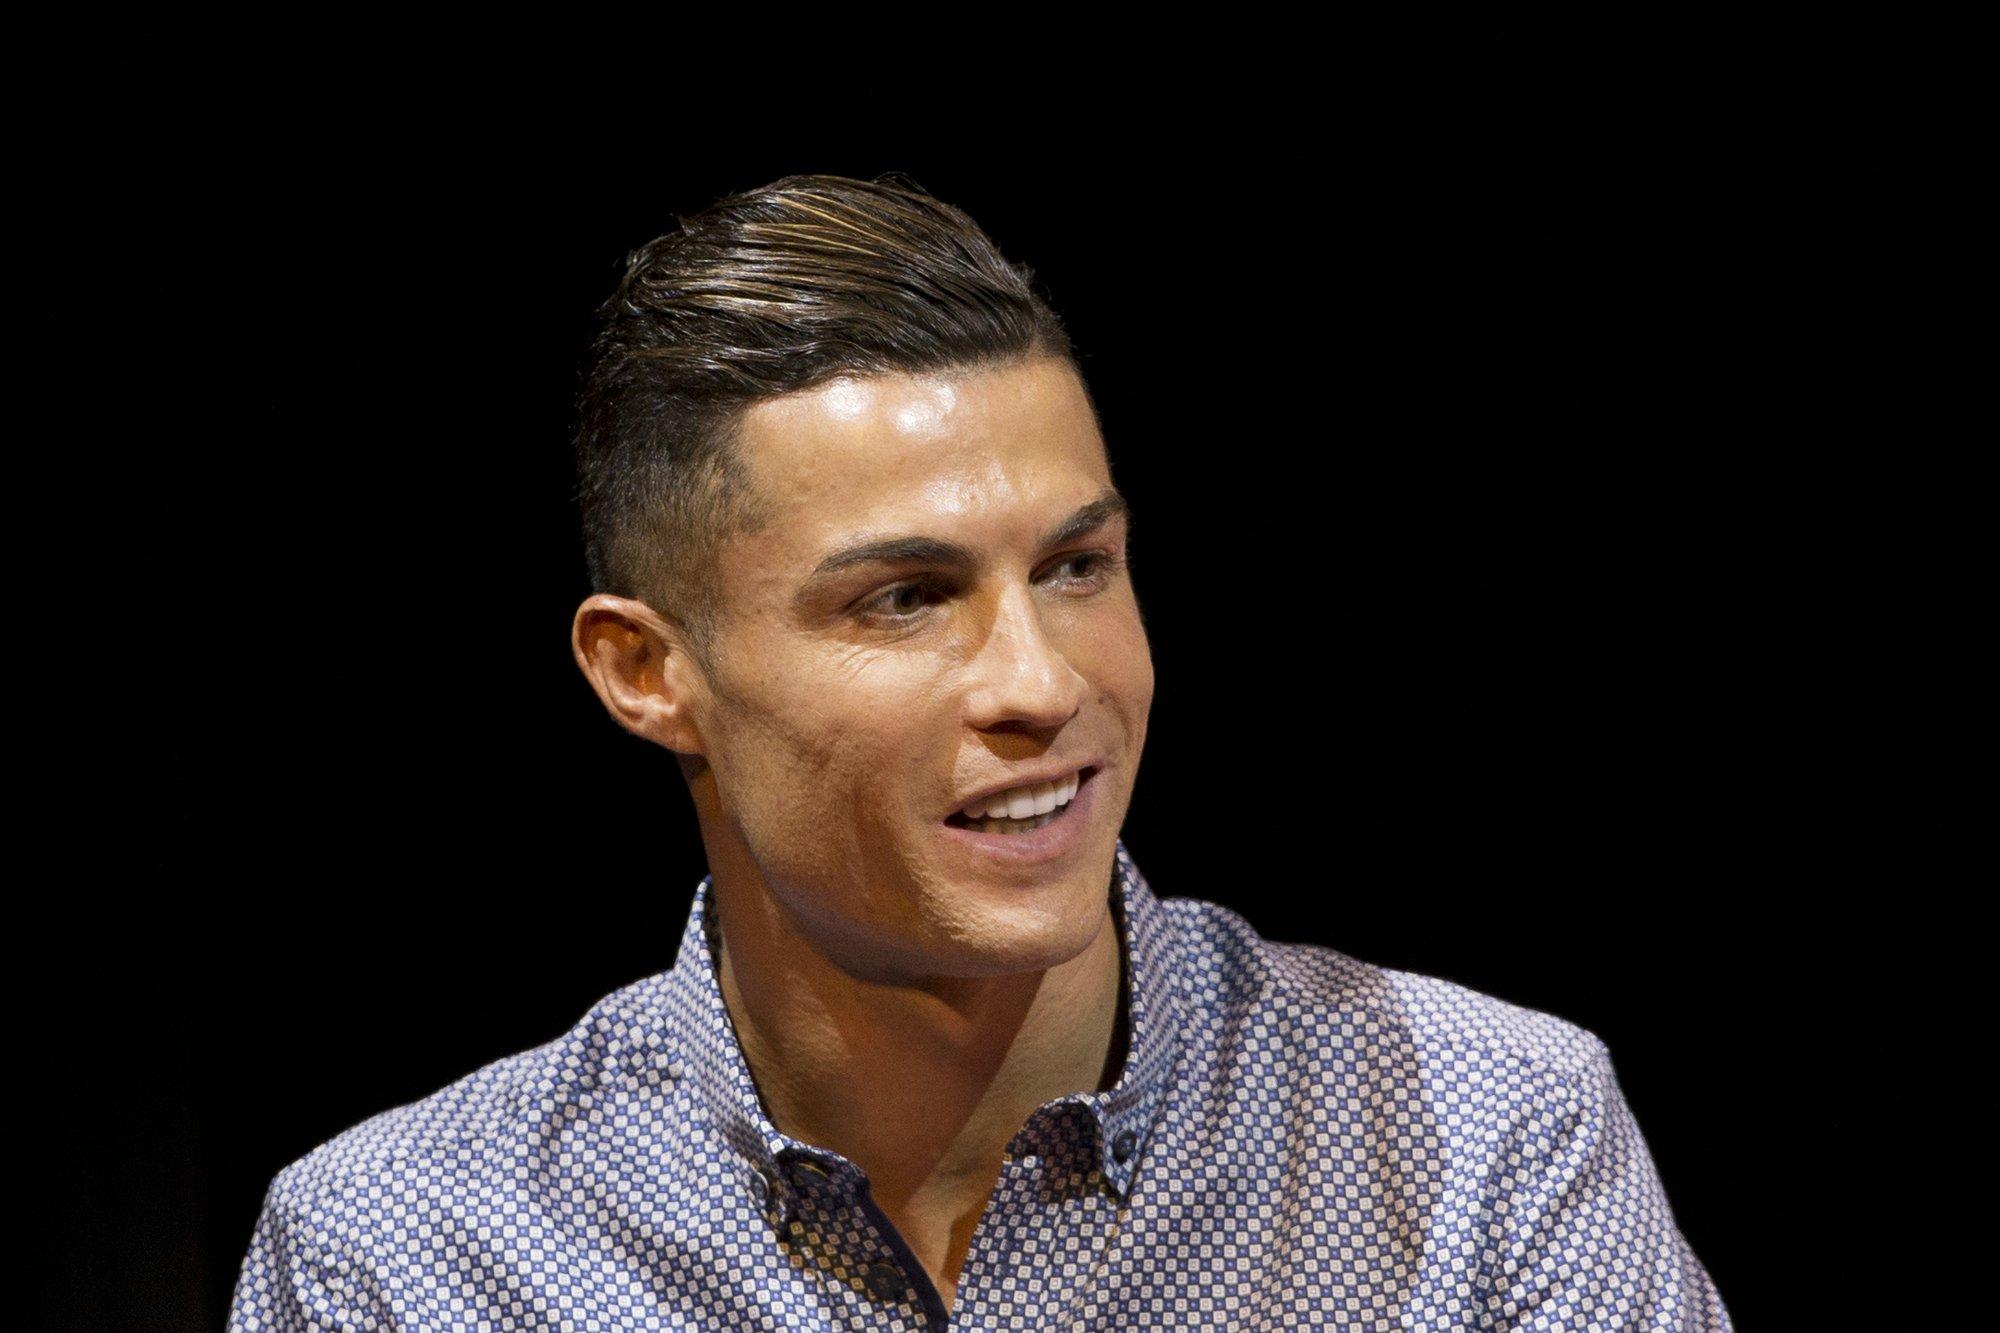 Ronaldo, Messi, Rapinoe nominated for FIFA awards